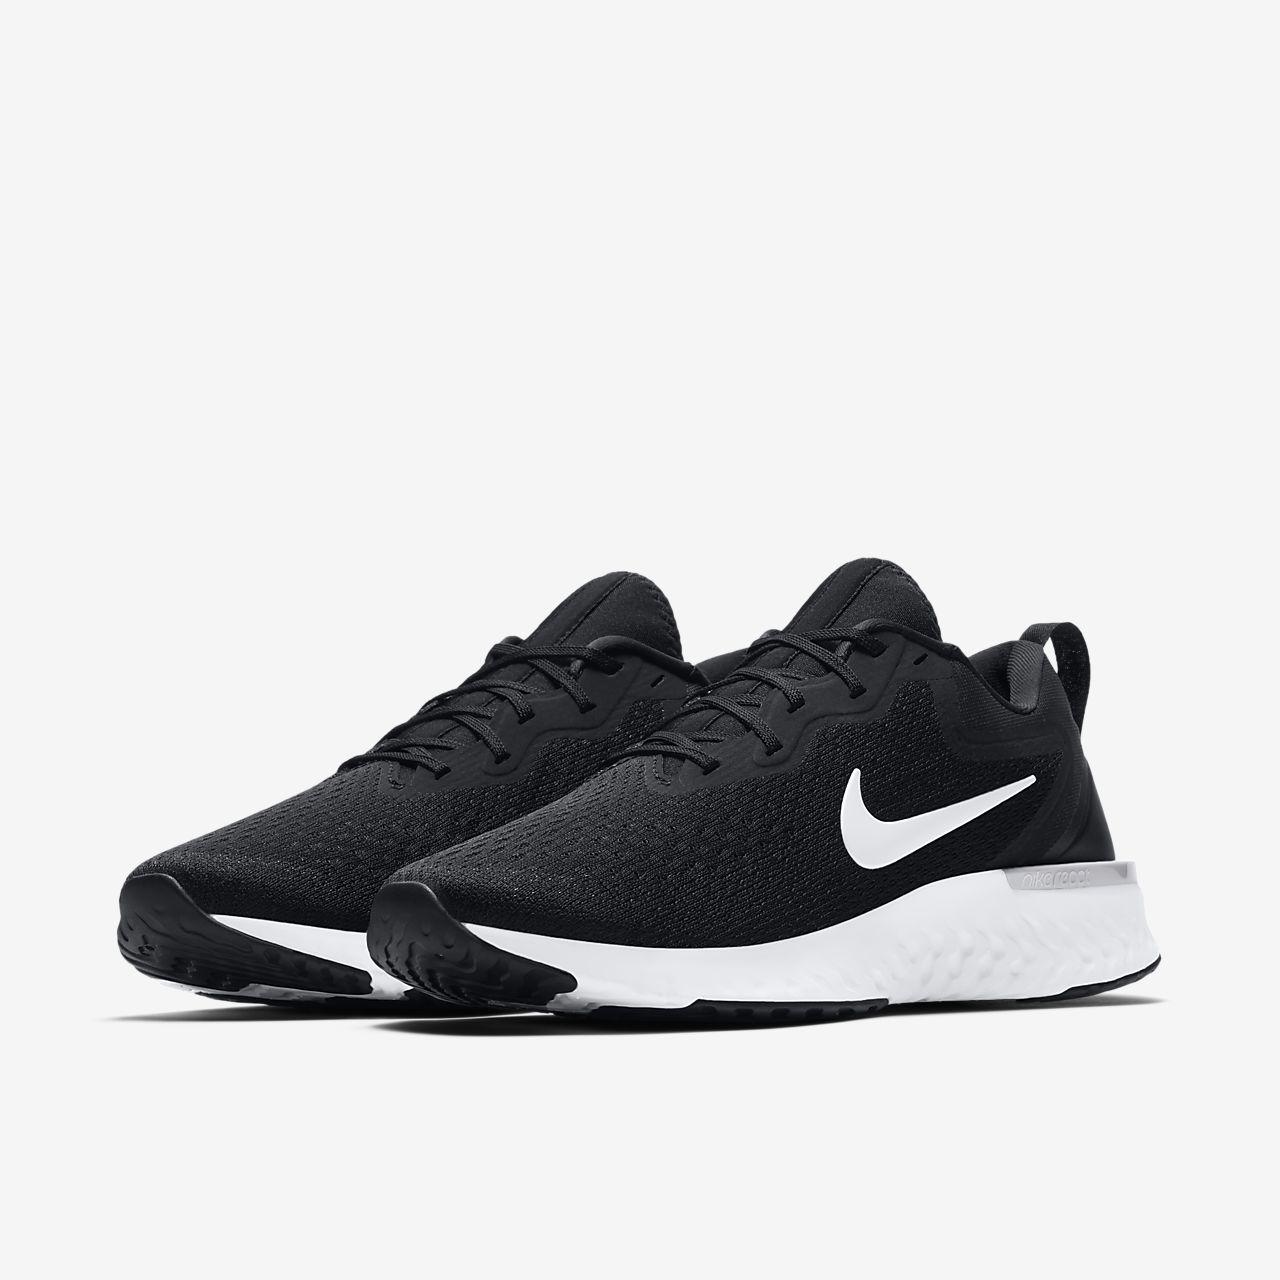 Nike Vol Bonafide - Chaussures - High-tops Et Baskets Nike 4QIyWHl